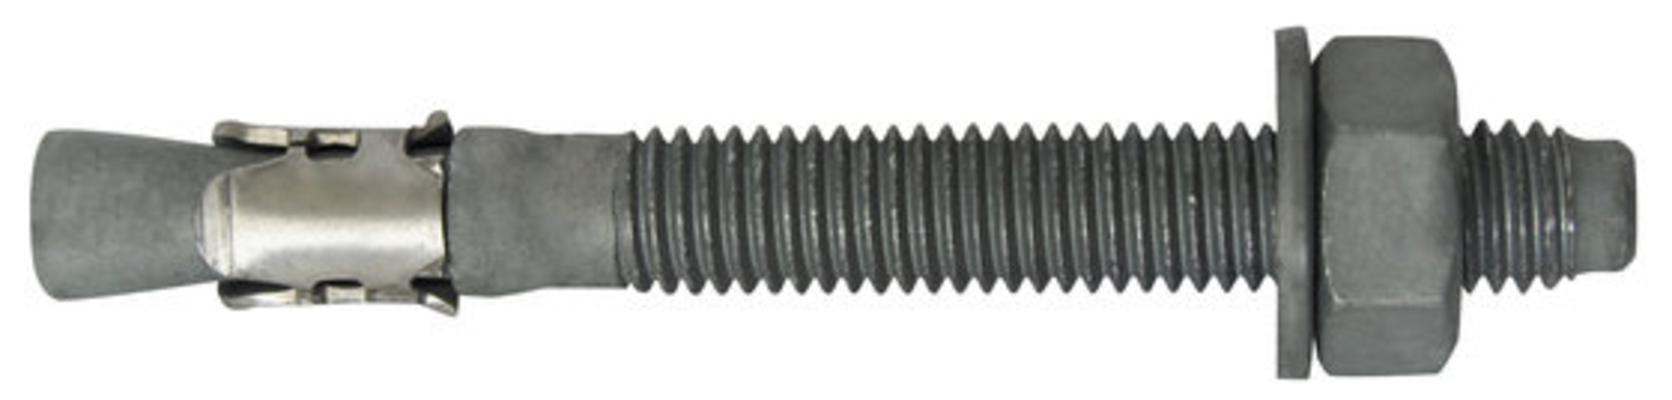 KIILA-ANKKURI 4KPL NAUTILUS - M12X80